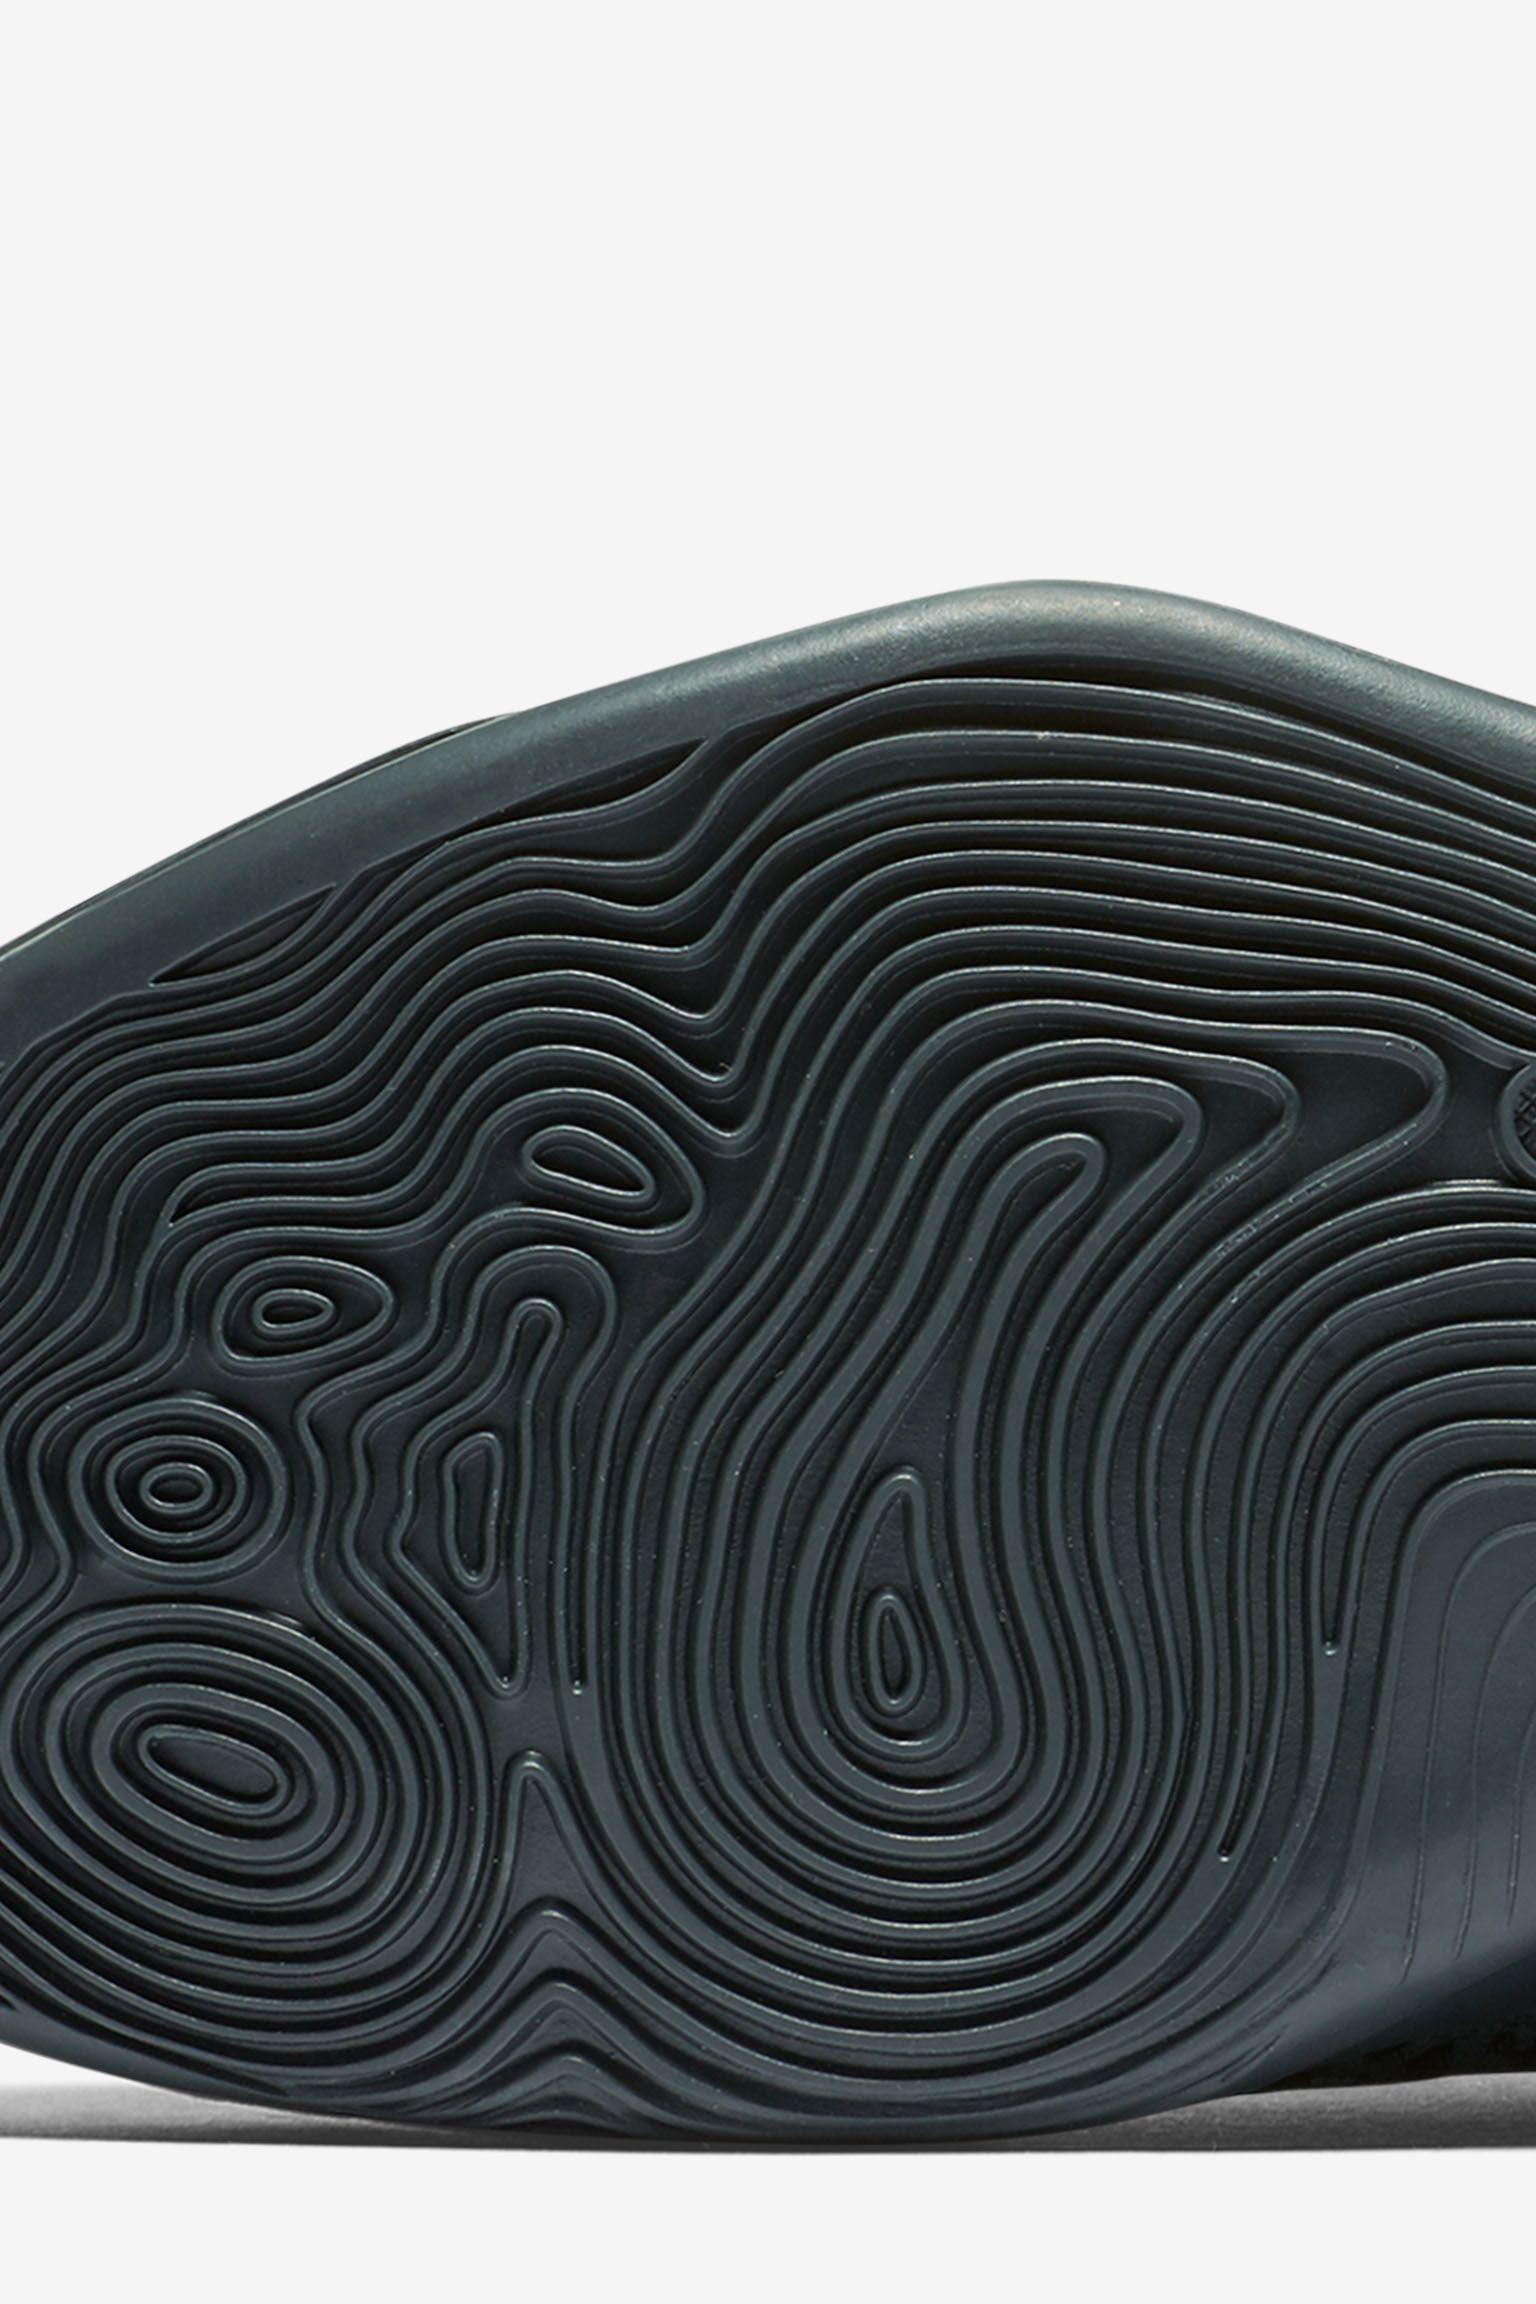 Nike Kobe 9 Elite 'FTB' Release Date